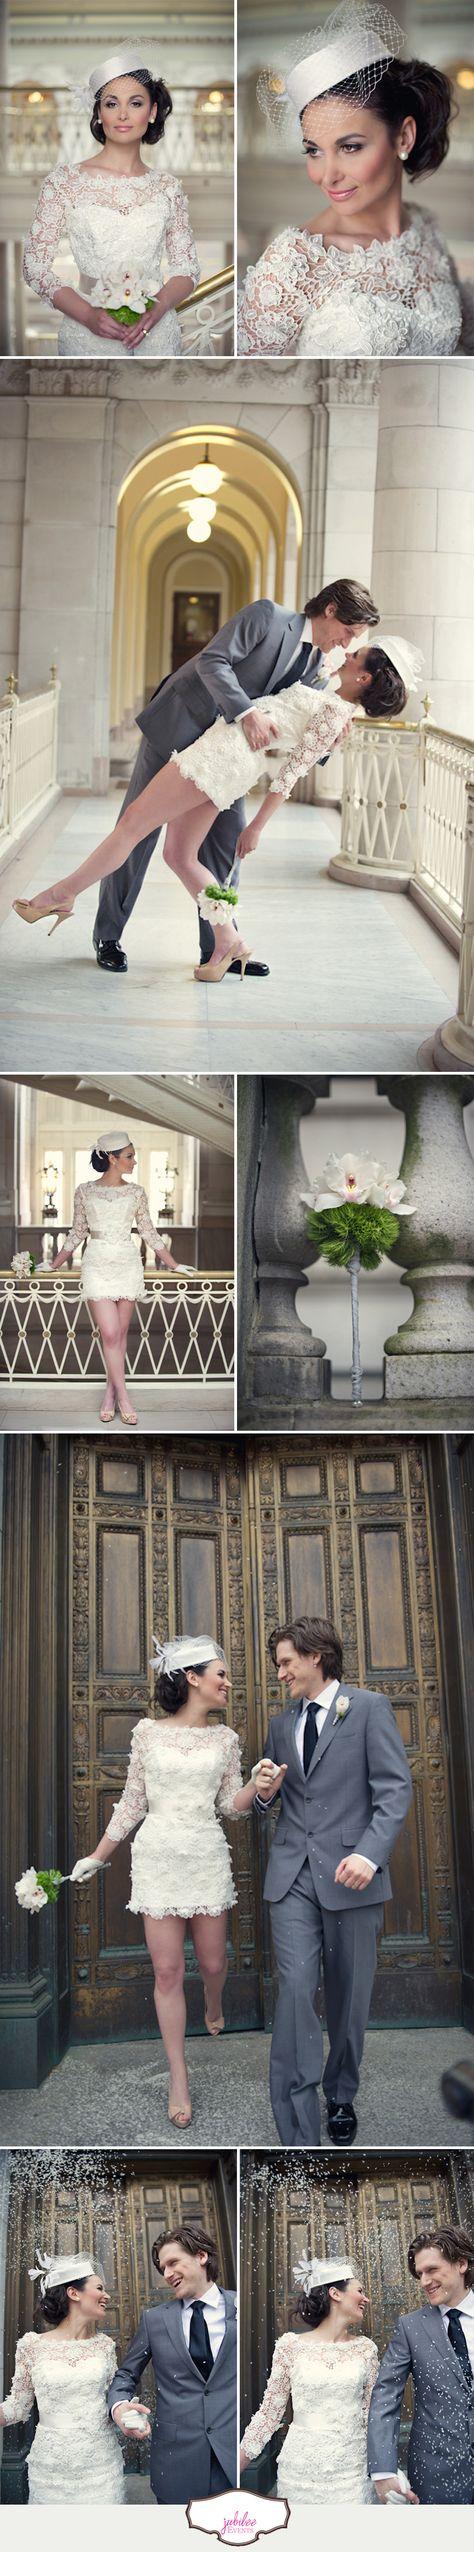 Kaylee Peacock Wedding Reception Dresses Sherri Hill Wedding